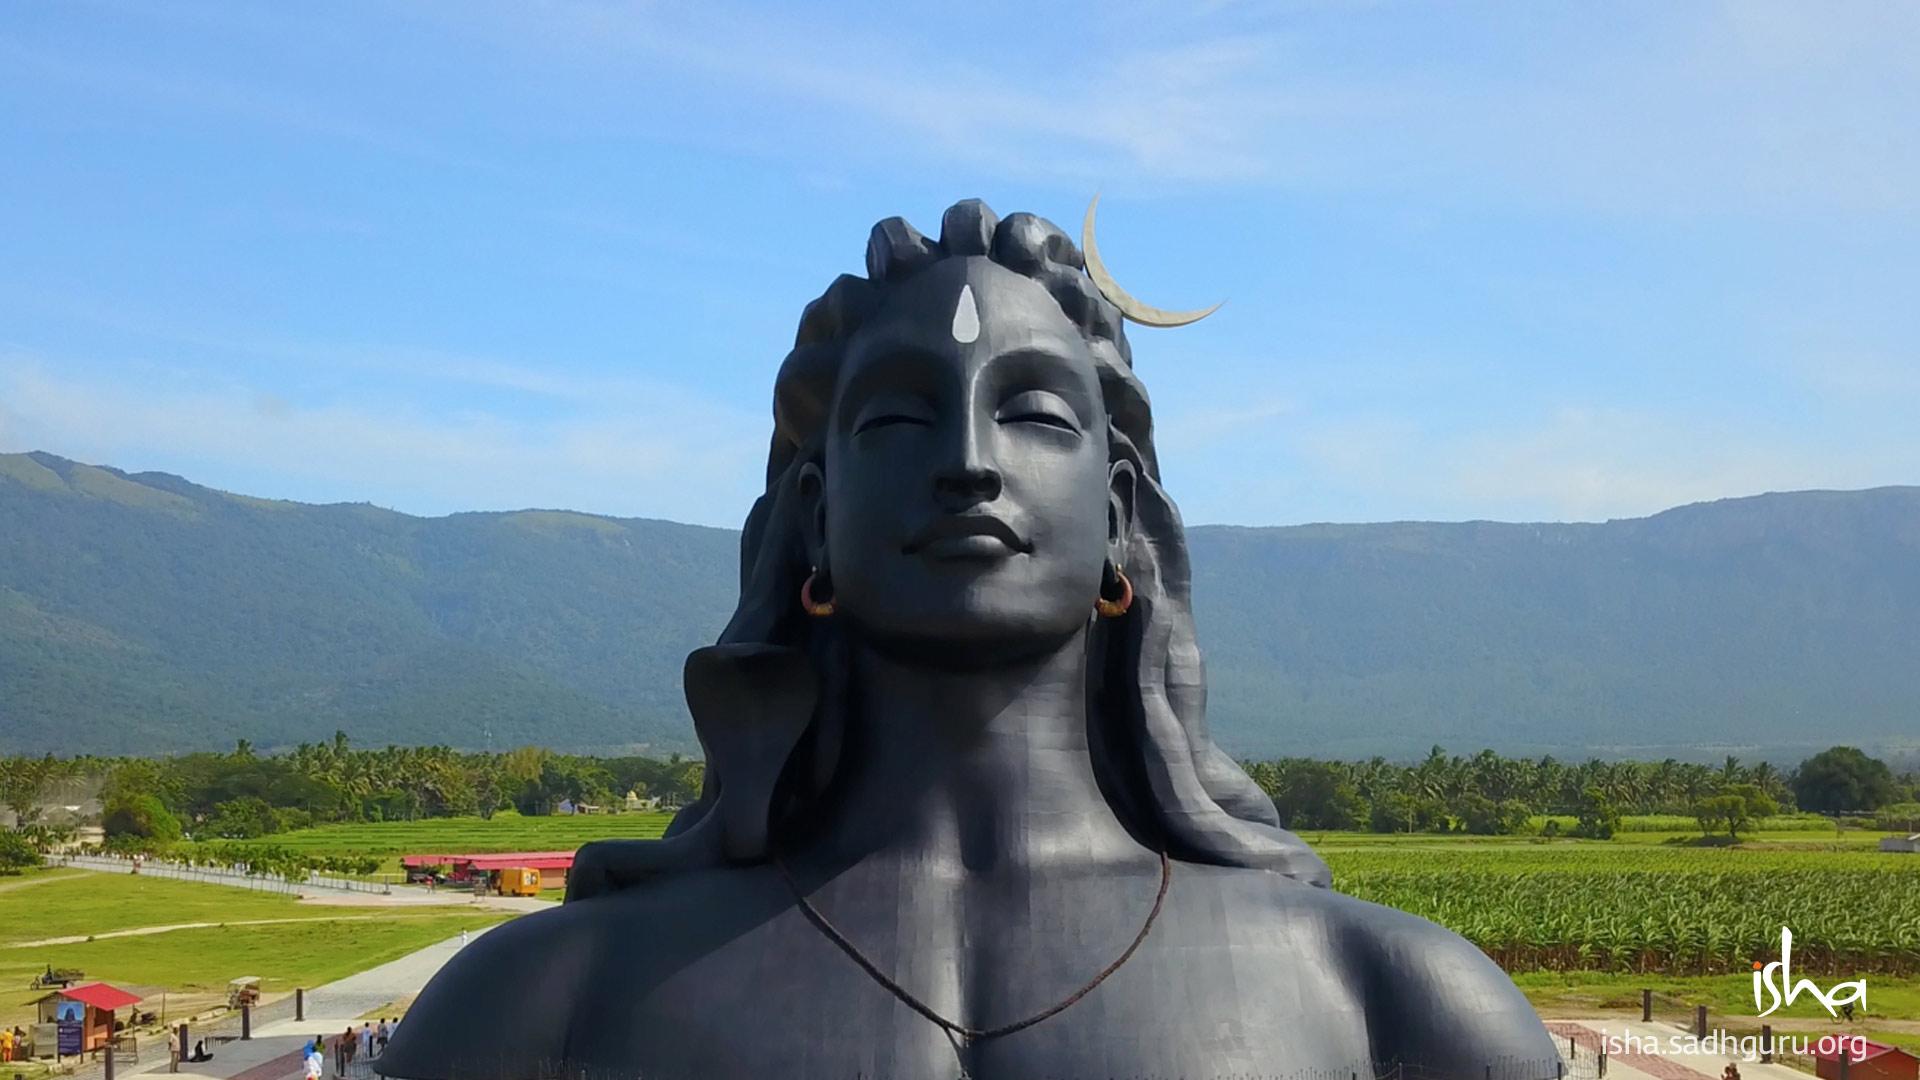 60 Shiva Adiyogi Wallpapers Hd Free Download For Mobile And Desktop